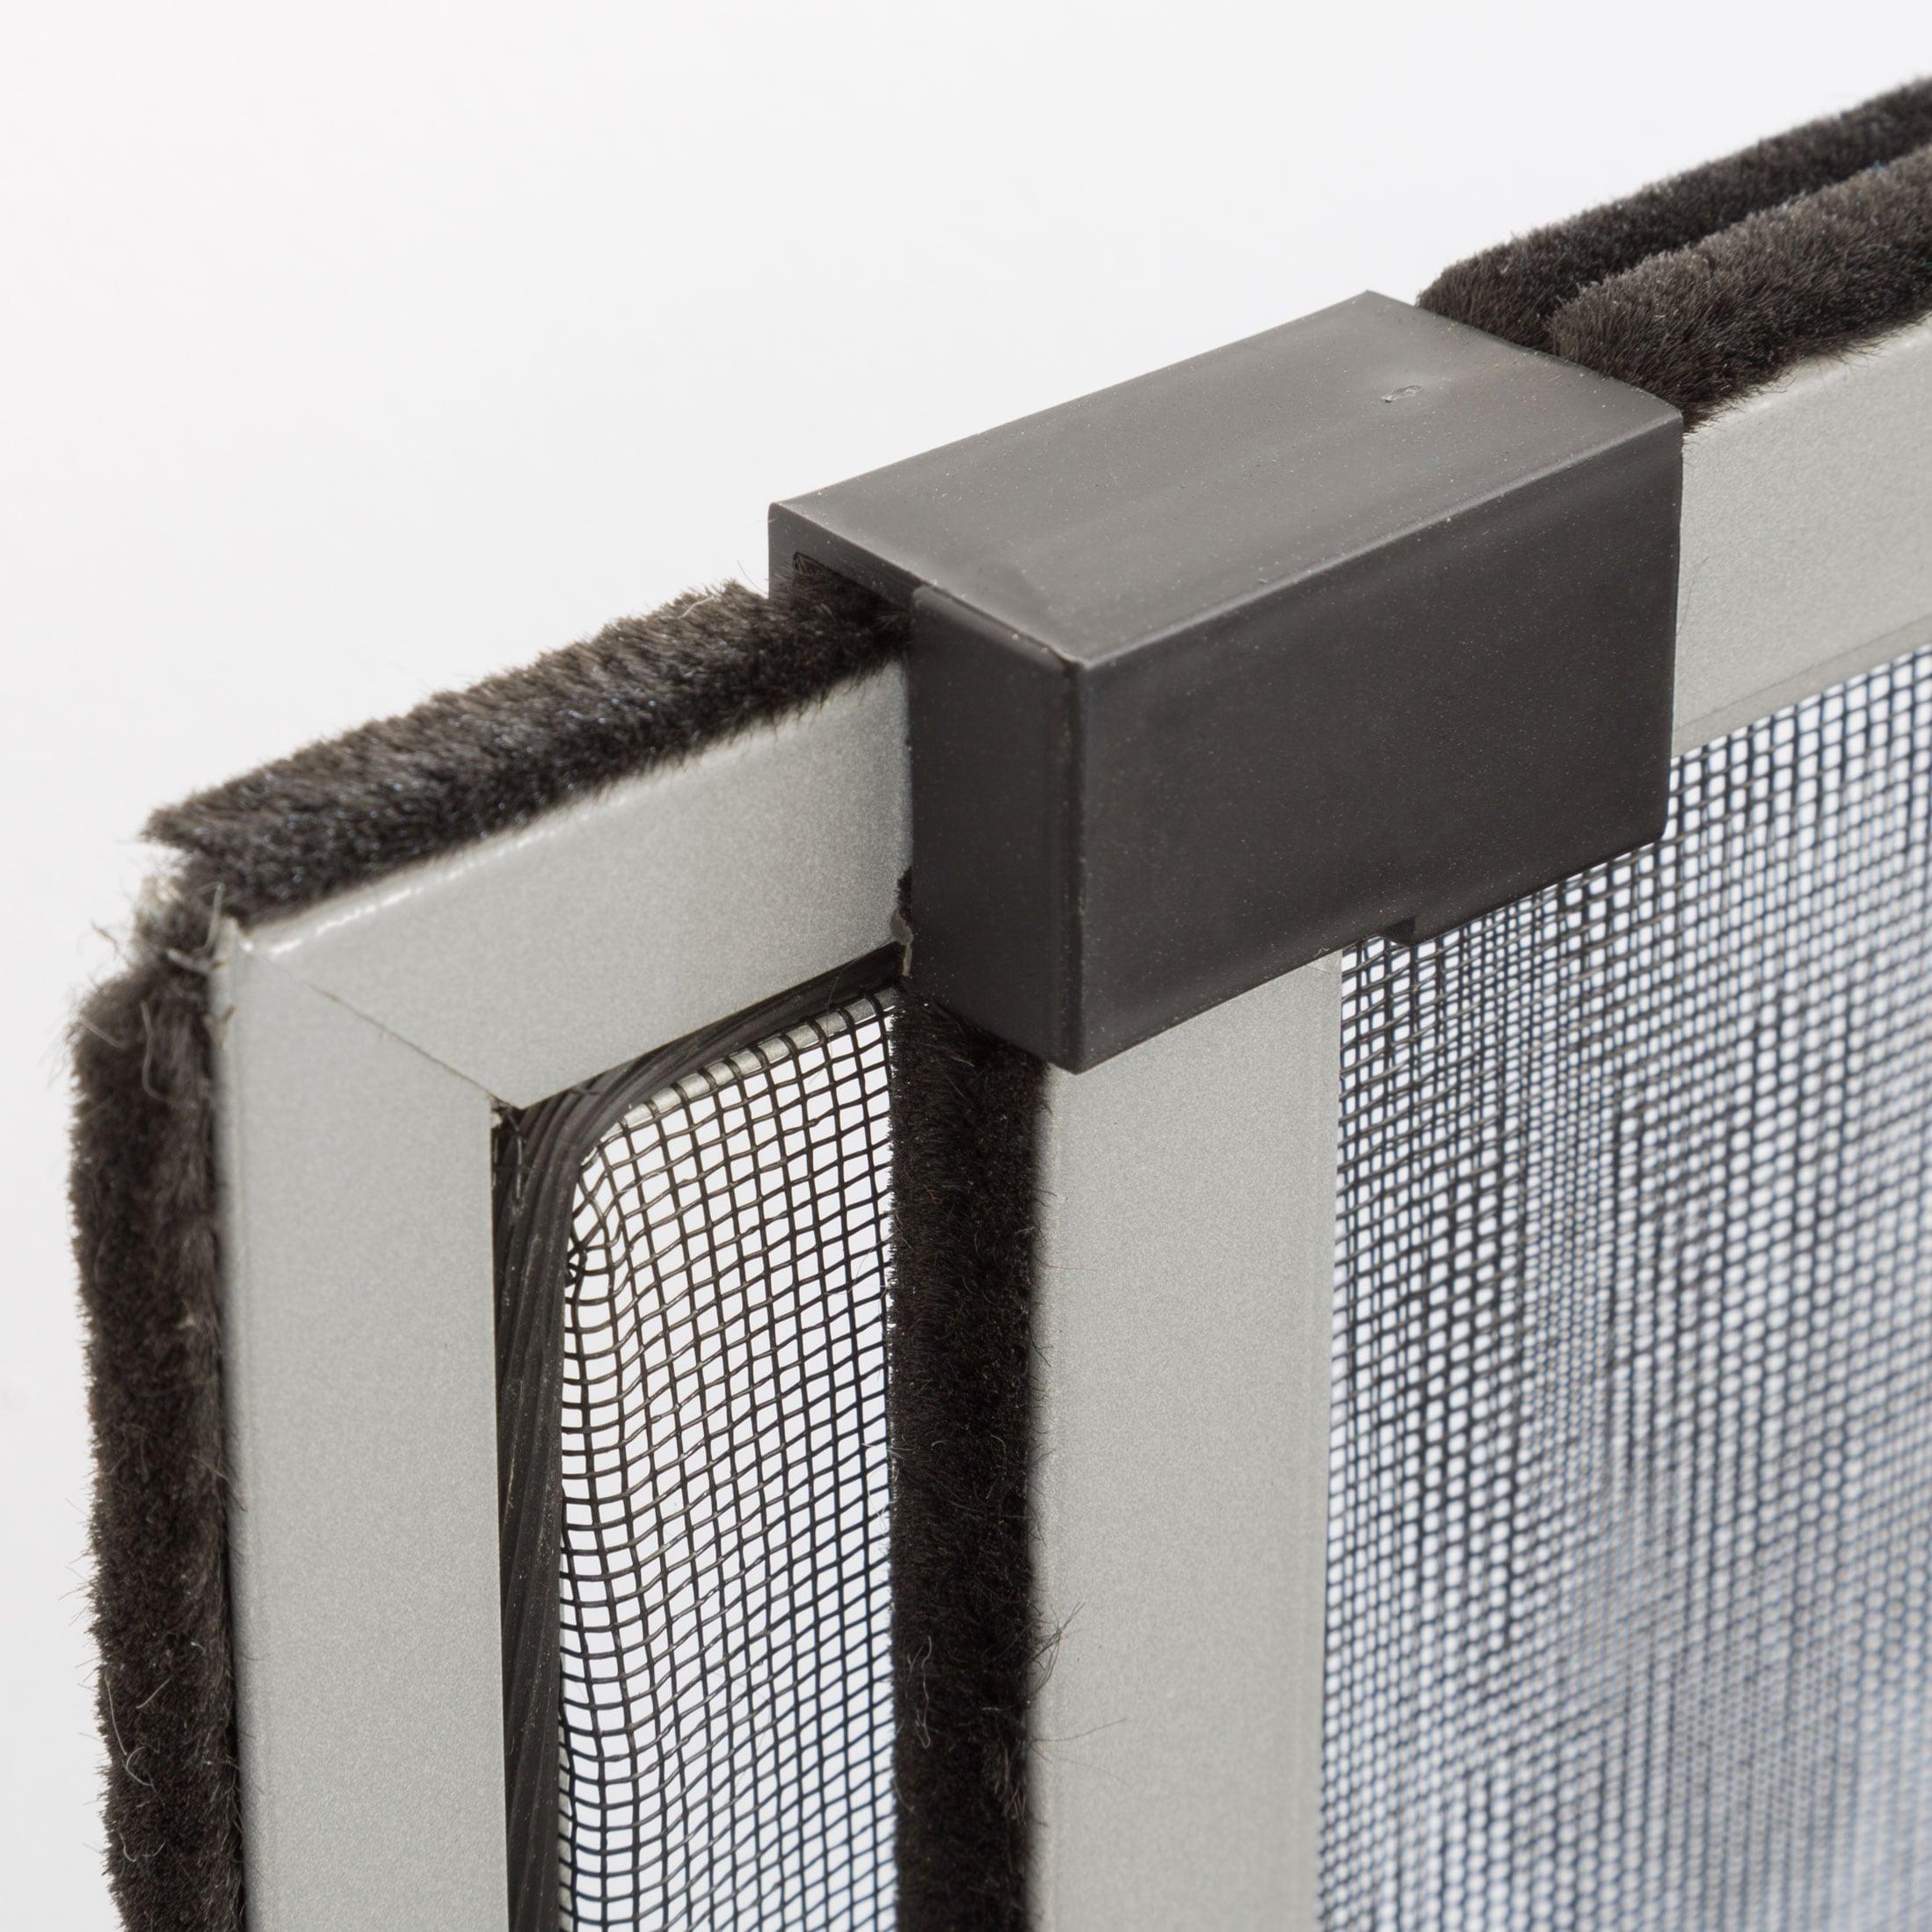 insektenschutz rahmen fliegengitter schieberahmen alurahmen ohne bohren gitter ebay. Black Bedroom Furniture Sets. Home Design Ideas